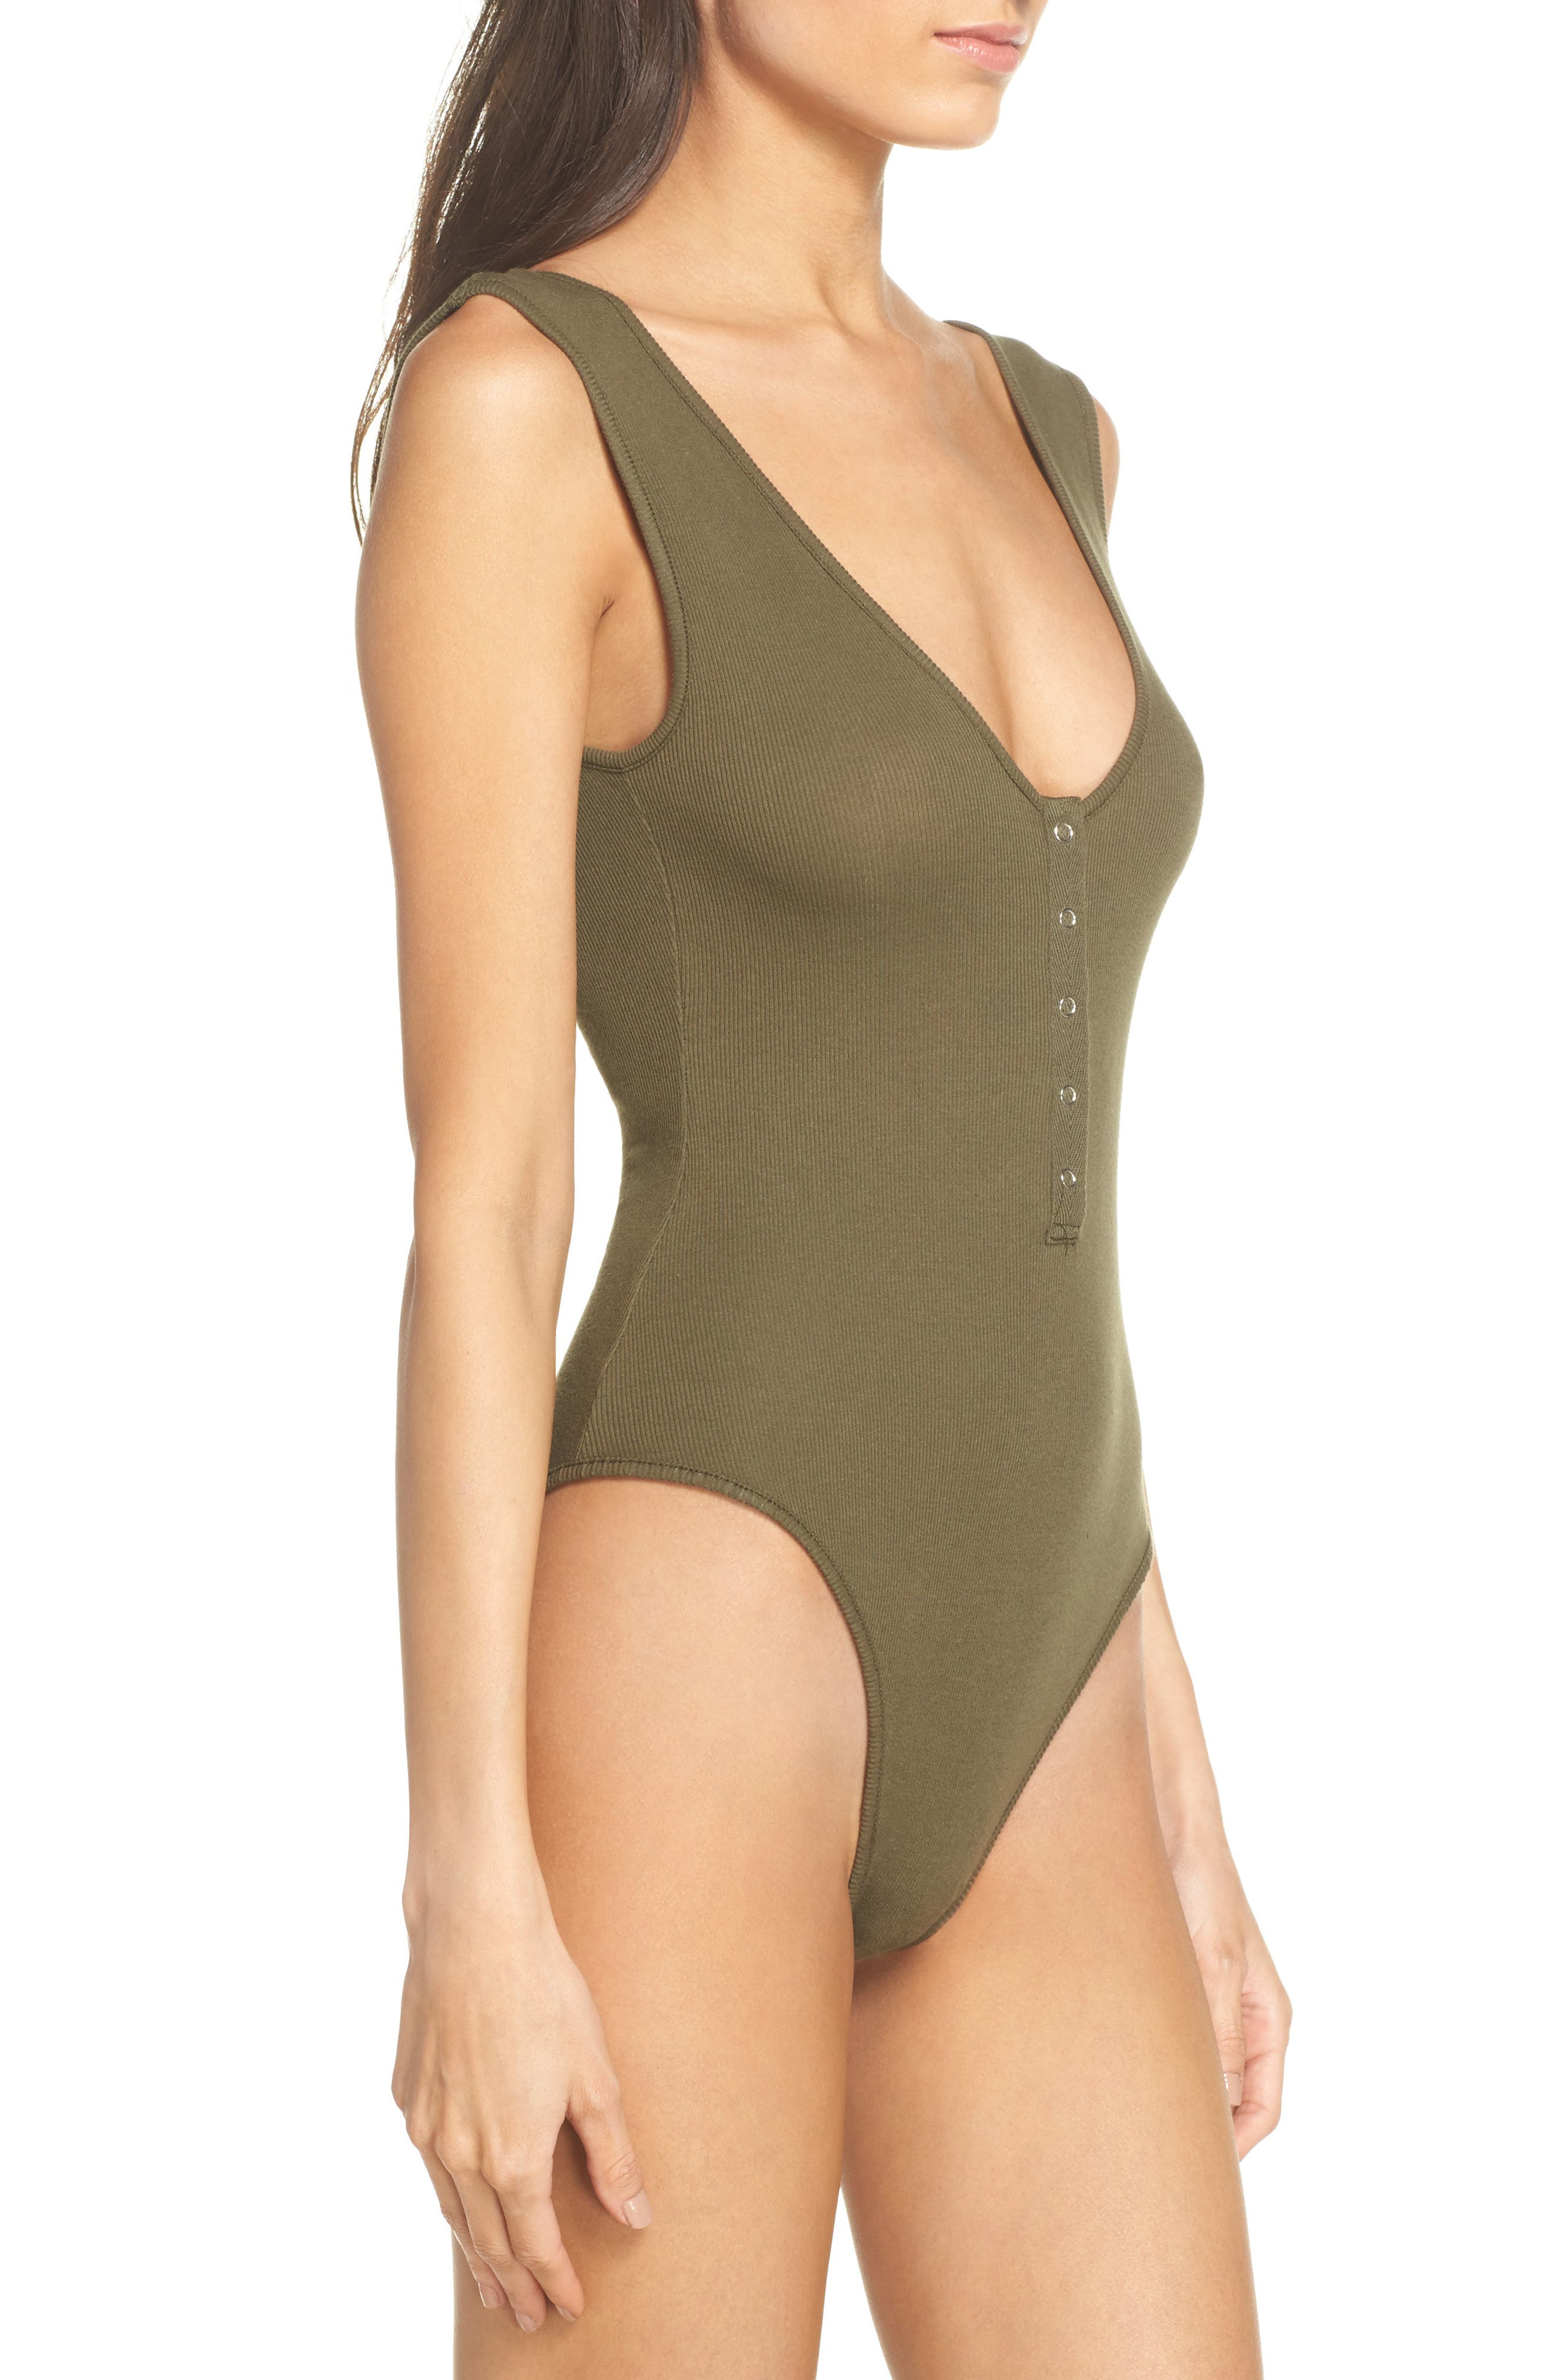 Intimately FP Tank Bodysuit,                             Alternate thumbnail 3, color,                             Army